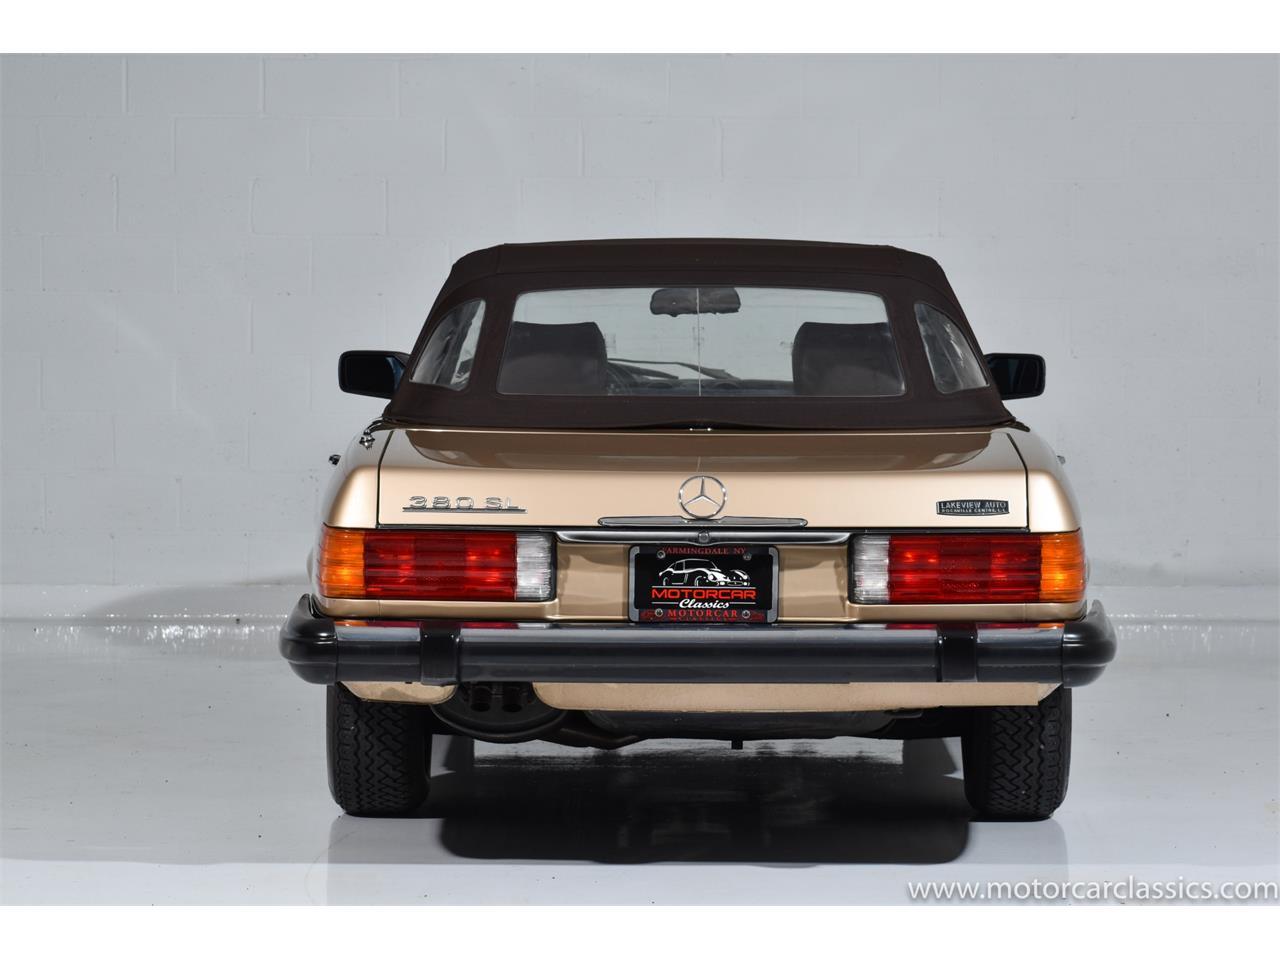 1982 Mercedes-Benz 380SL (CC-1250262) for sale in Farmingdale, New York